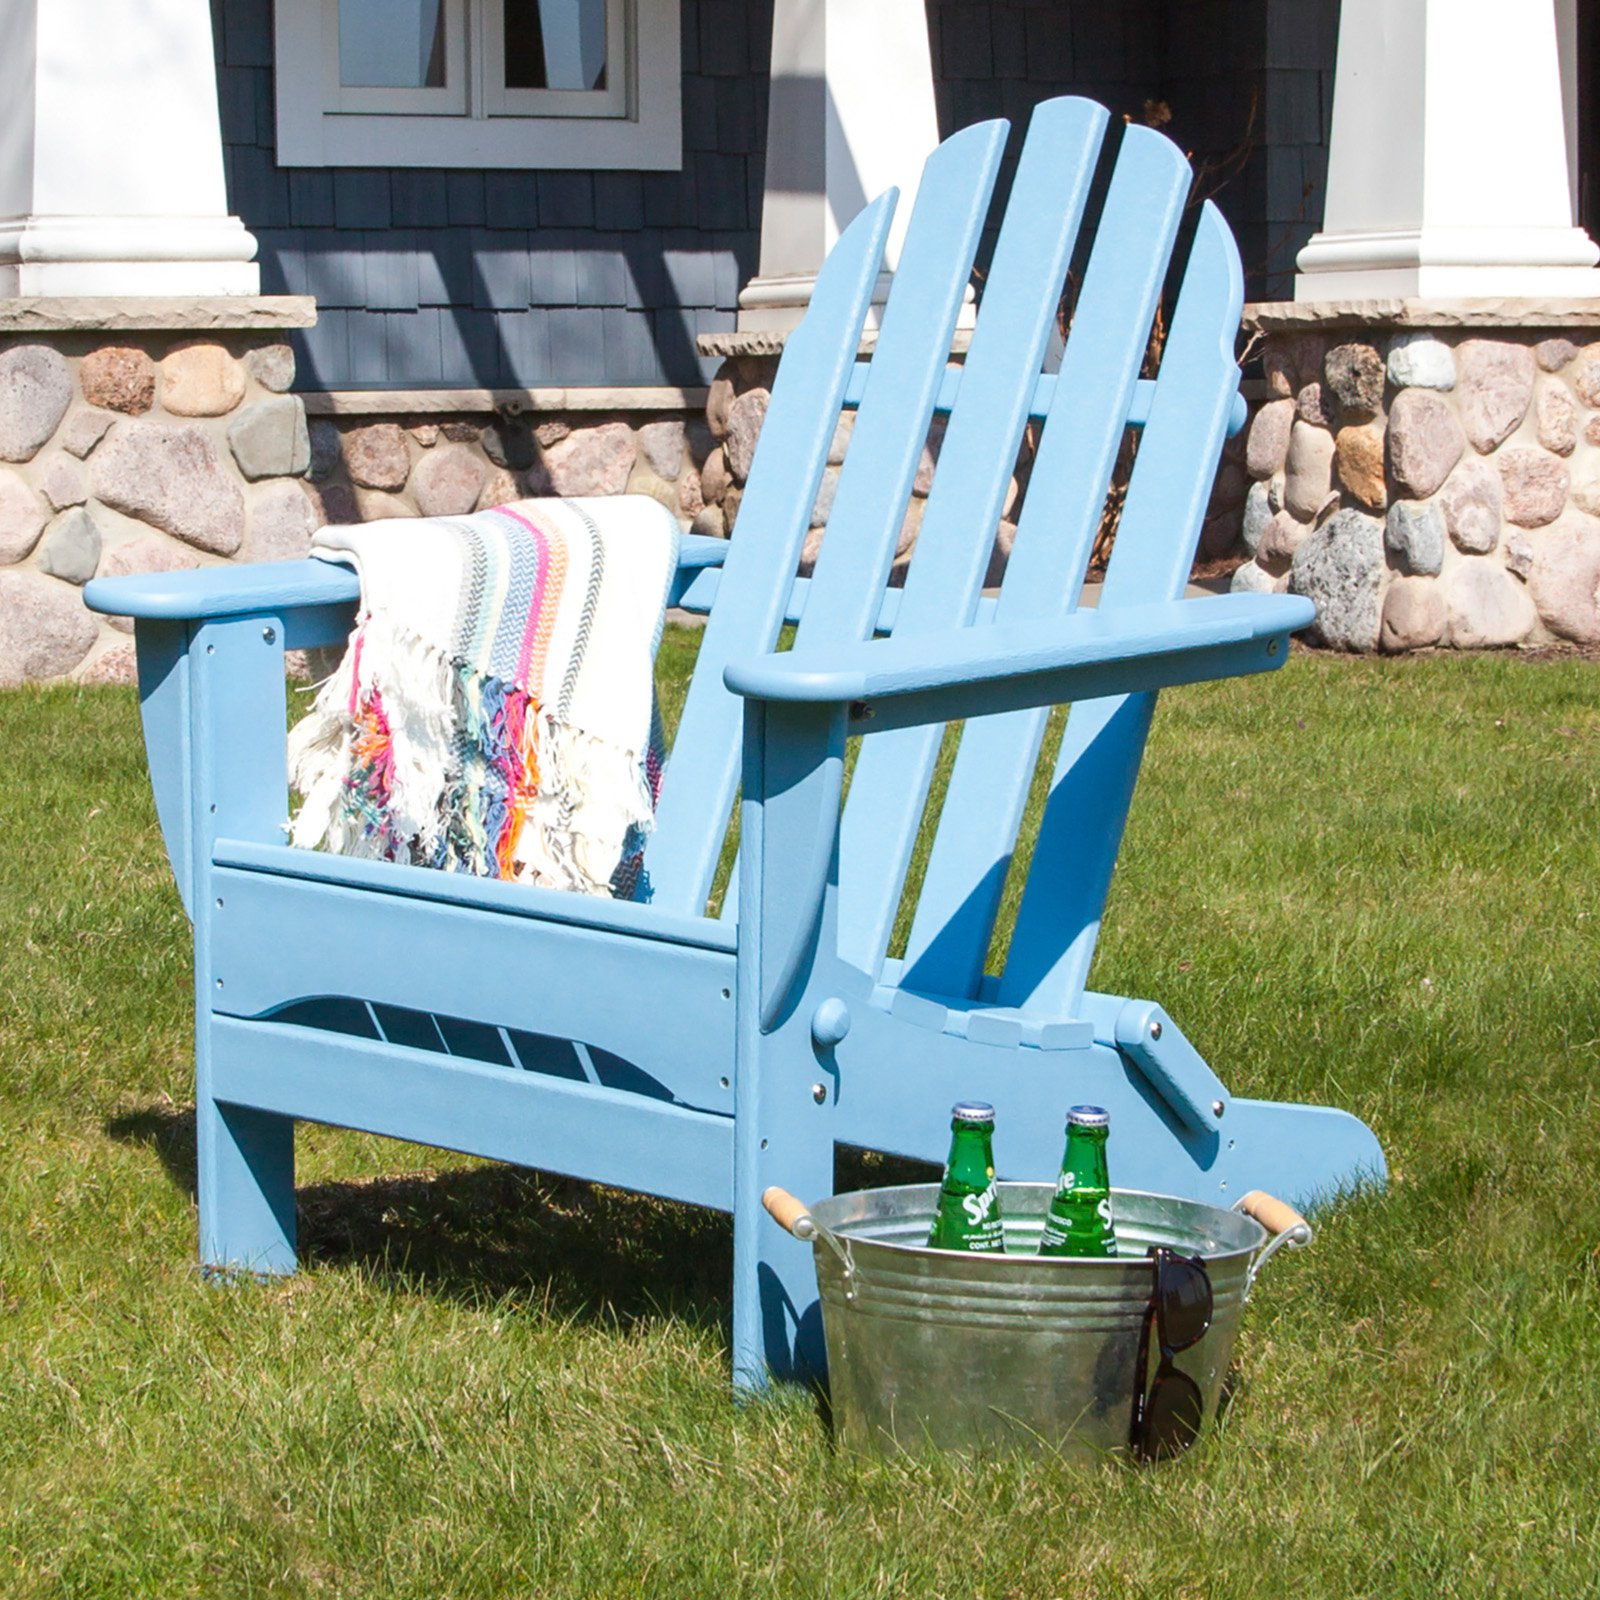 POLYWOODreg Classic Recycled Plastic Foldable Adirondack Chair